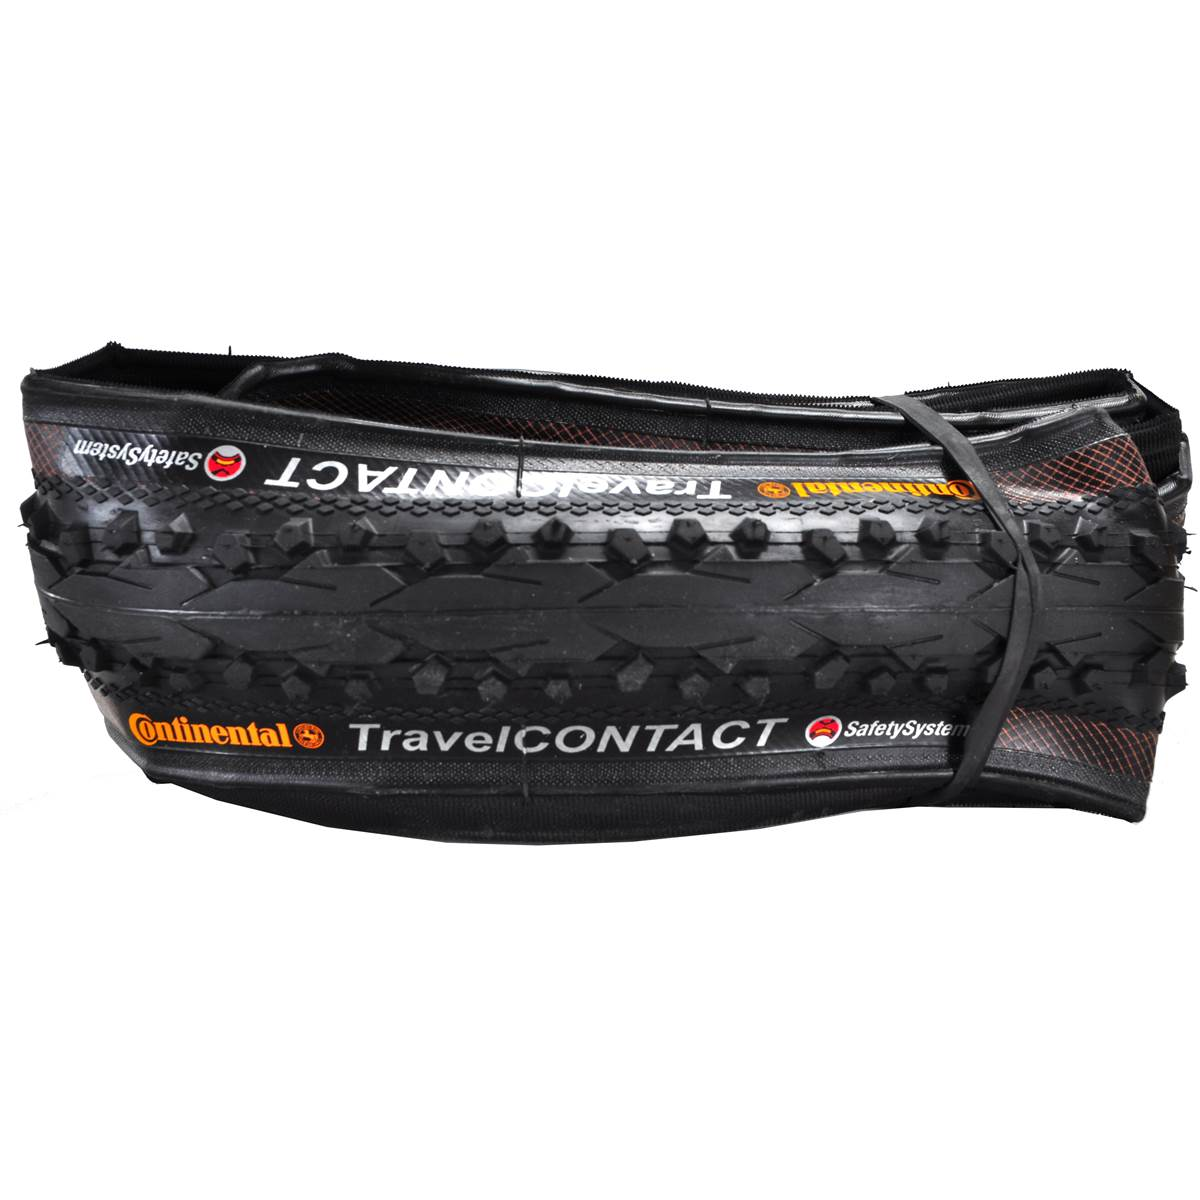 Pneu pour vélo 700 x 37 Travel Contact Continental